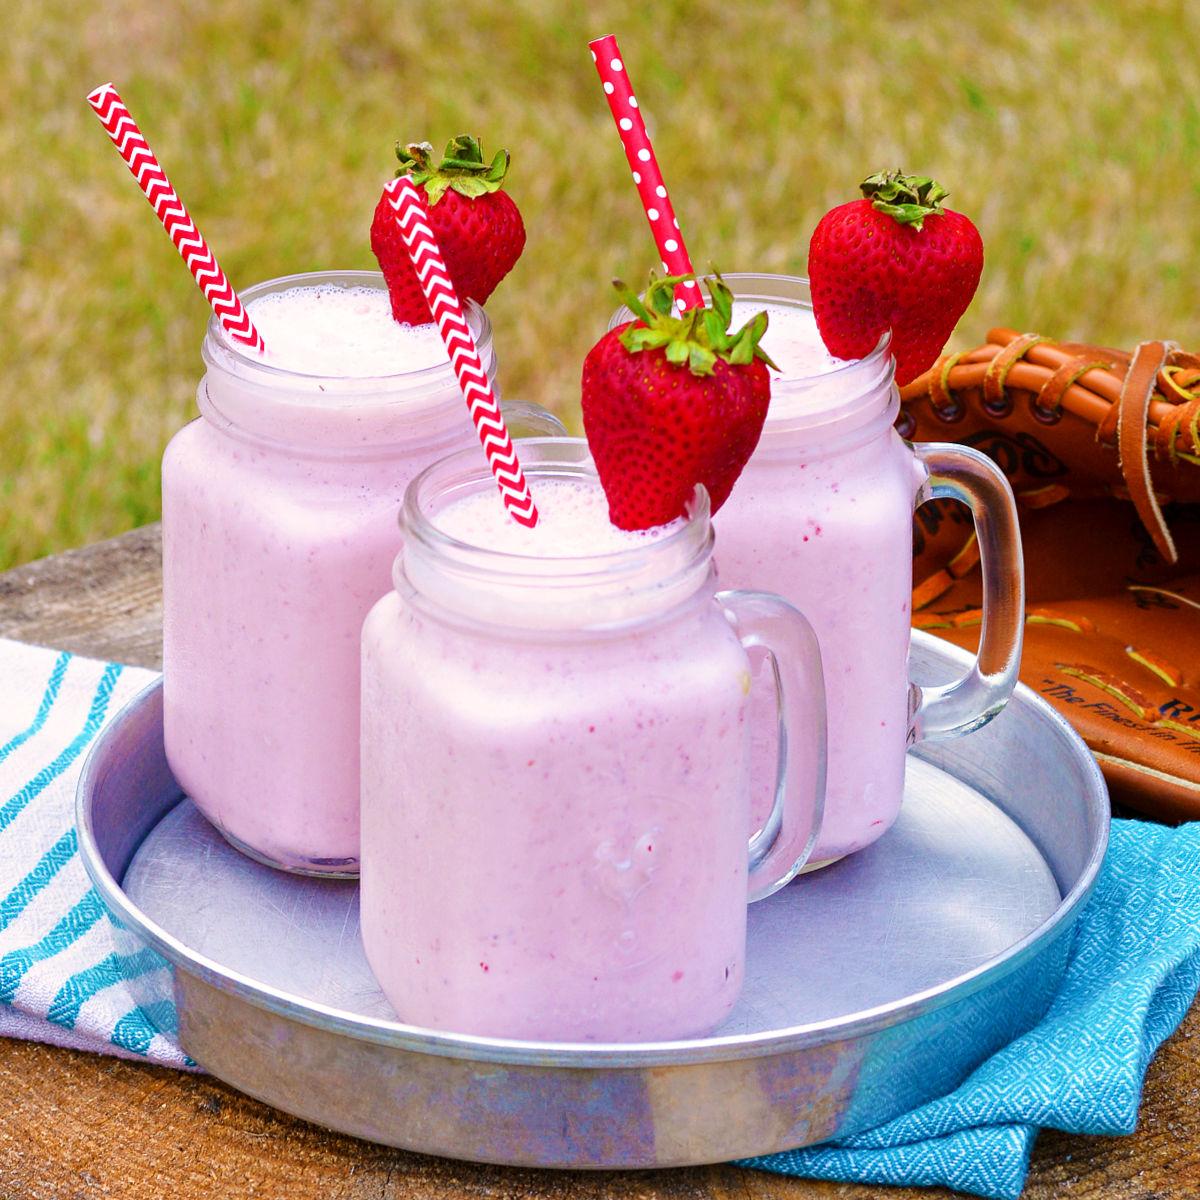 Three strawberry milkshakes on a silver serving tray